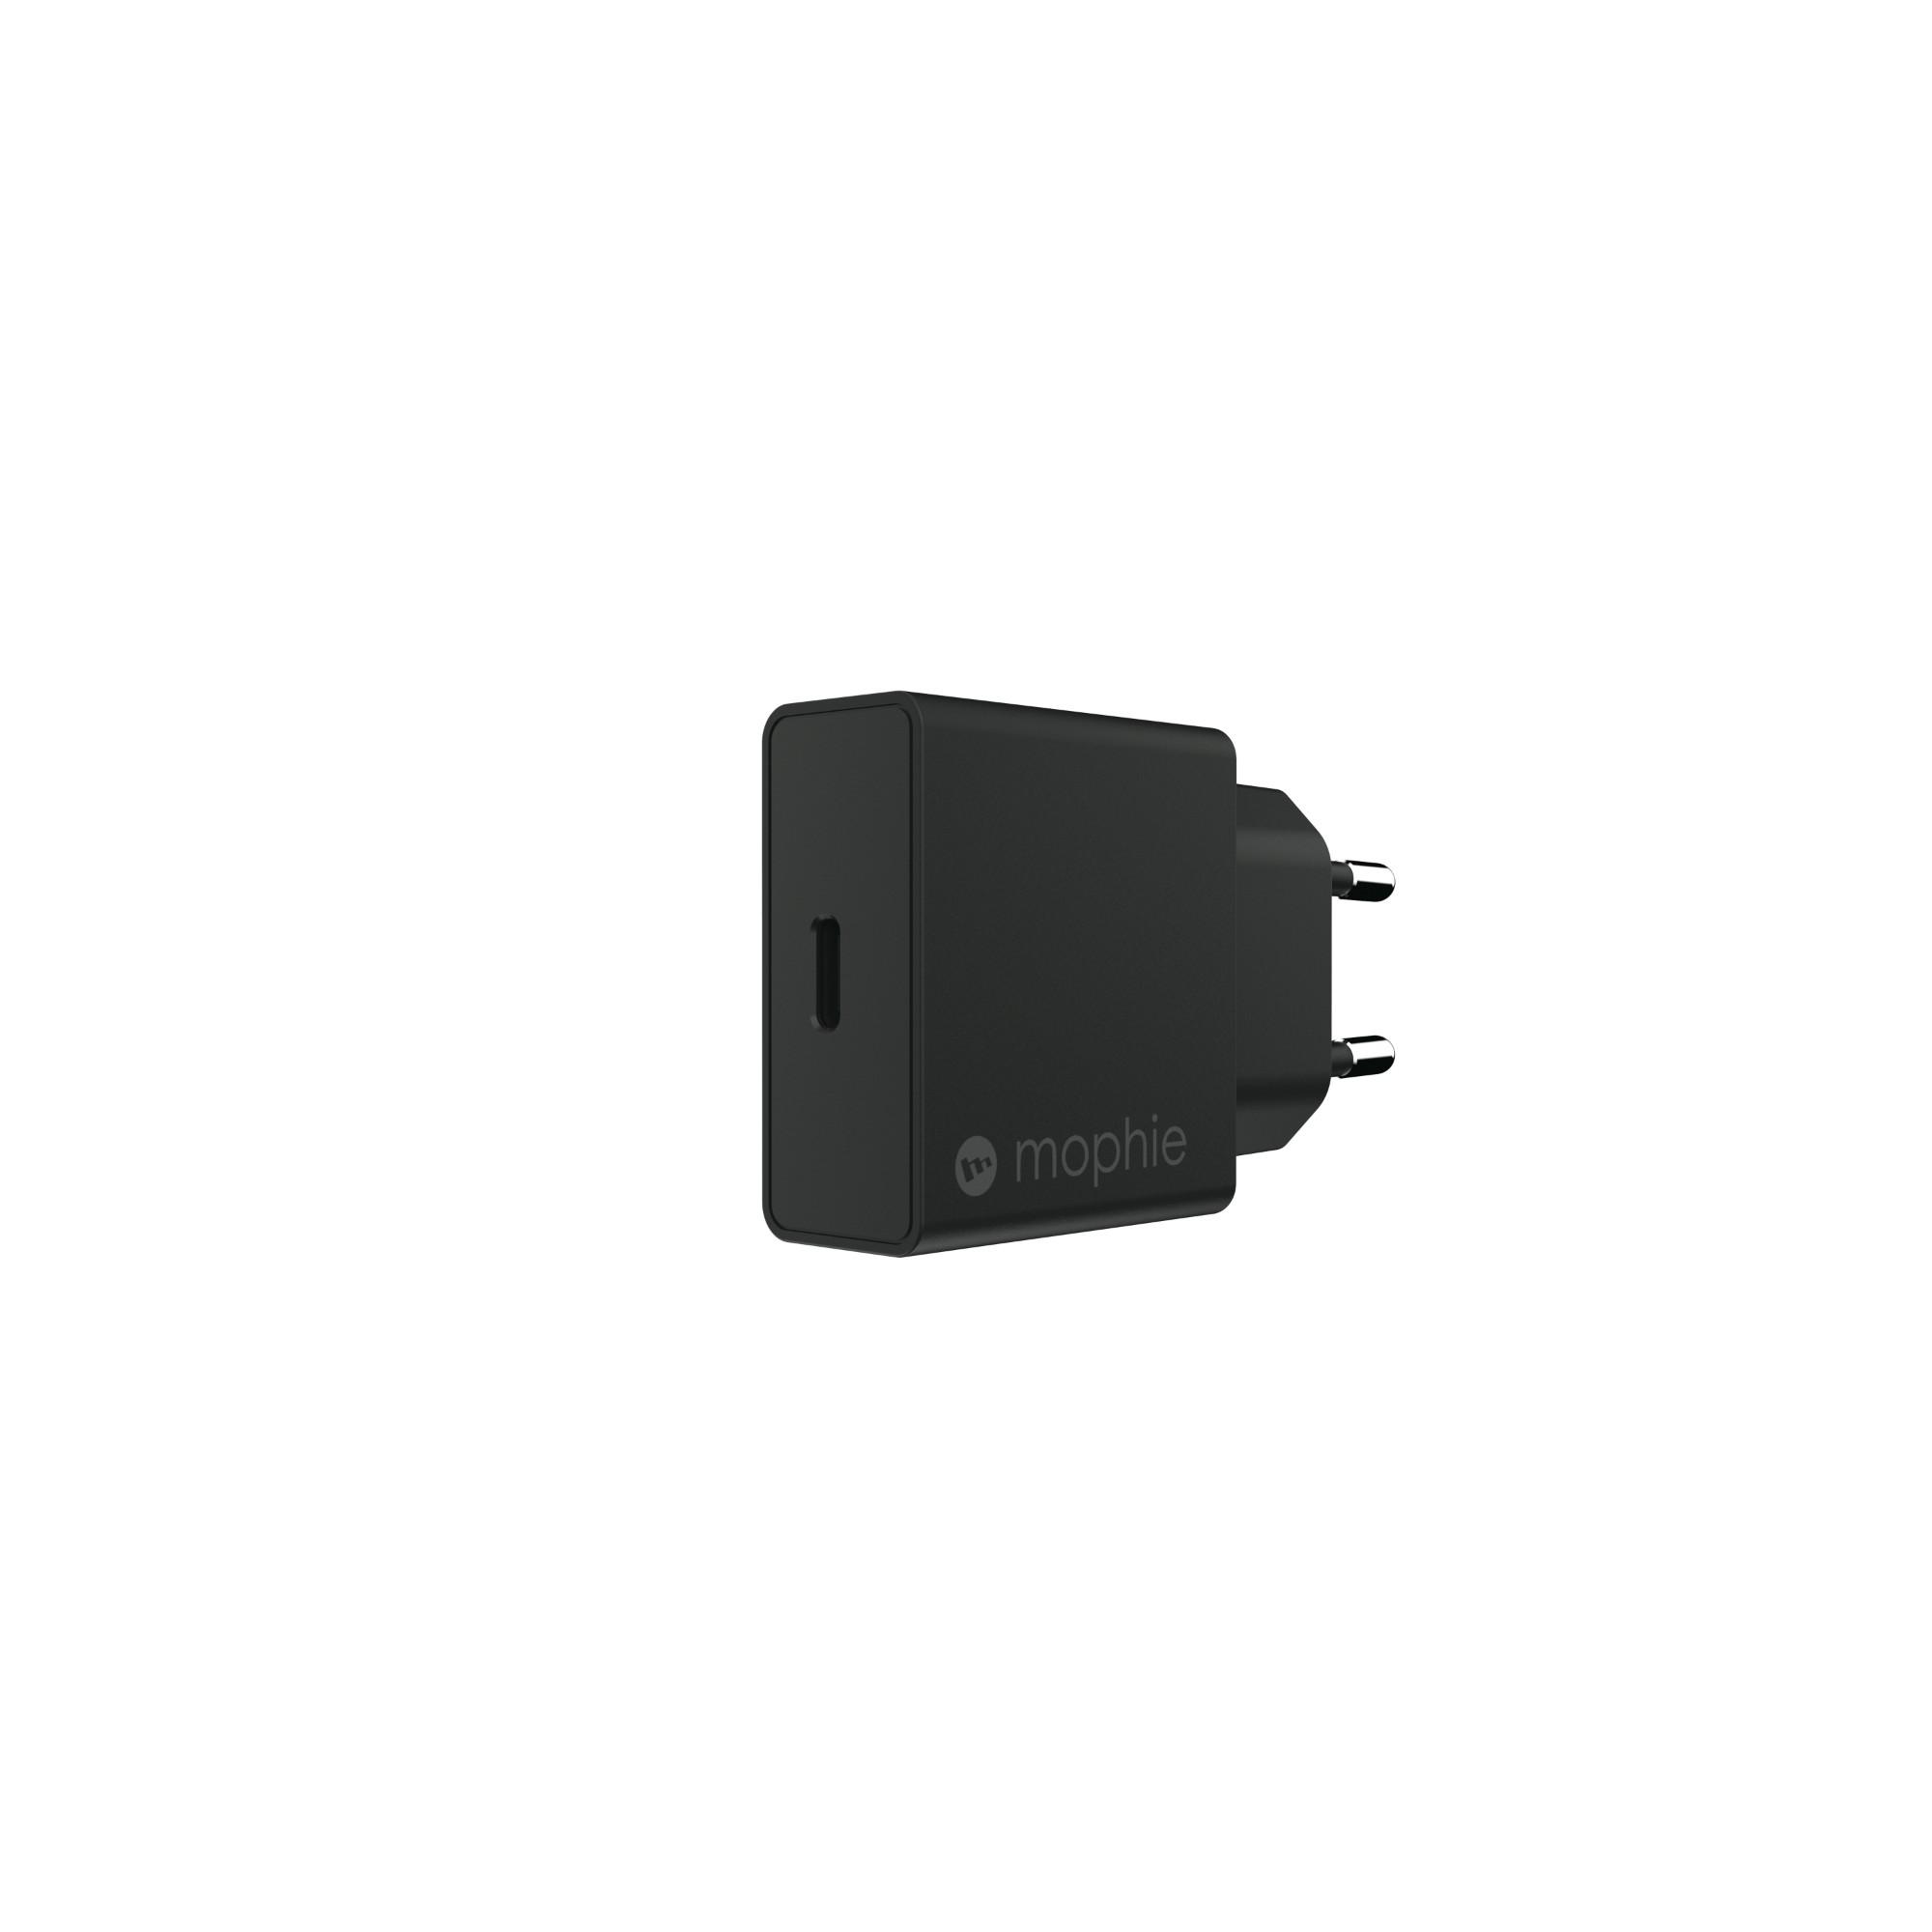 mophie 409903235 cargador de dispositivo móvil Interior Negro